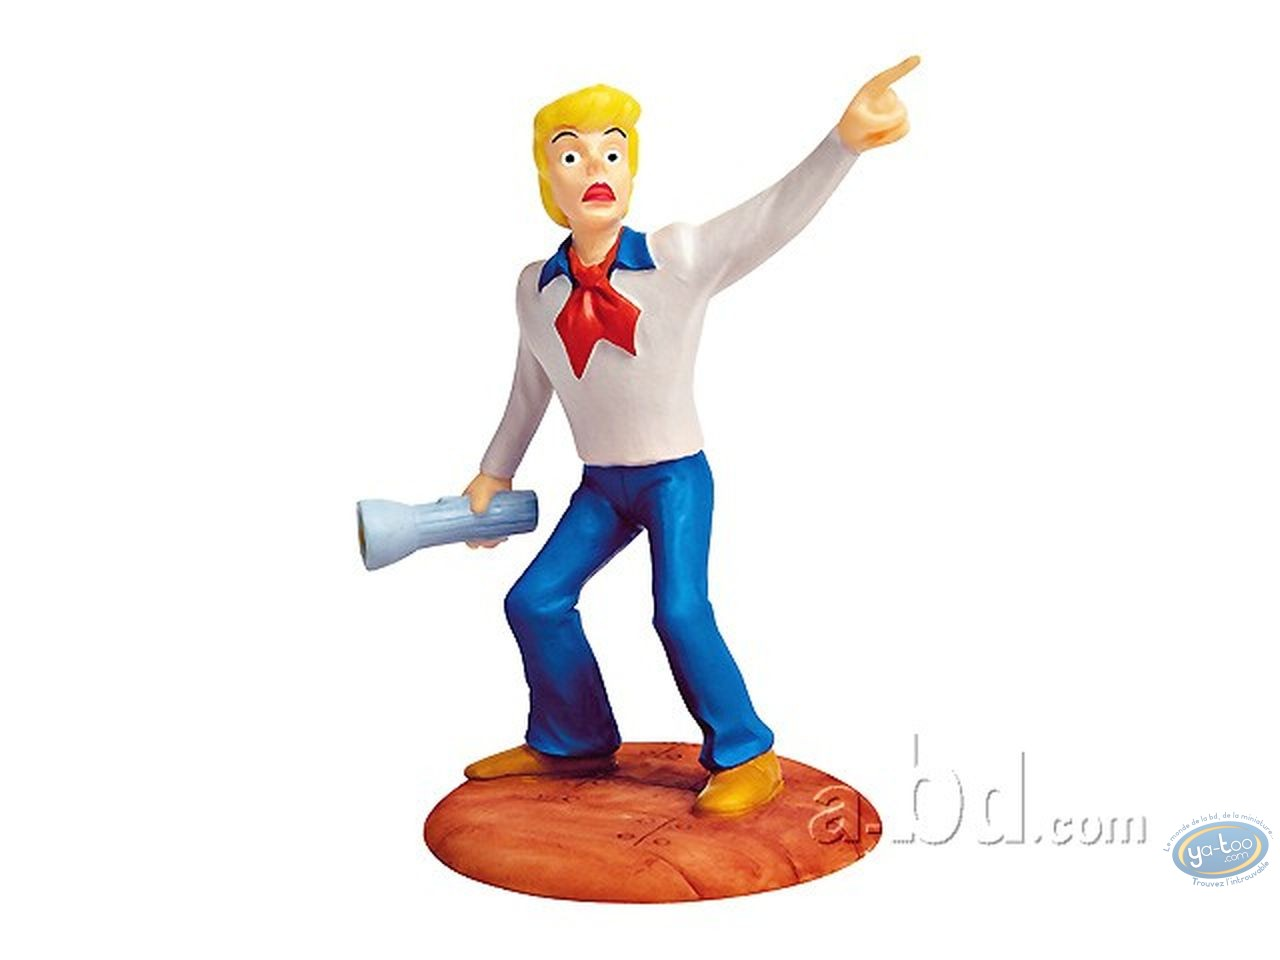 Statuette résine, Scooby-Doo : Fred + lampe